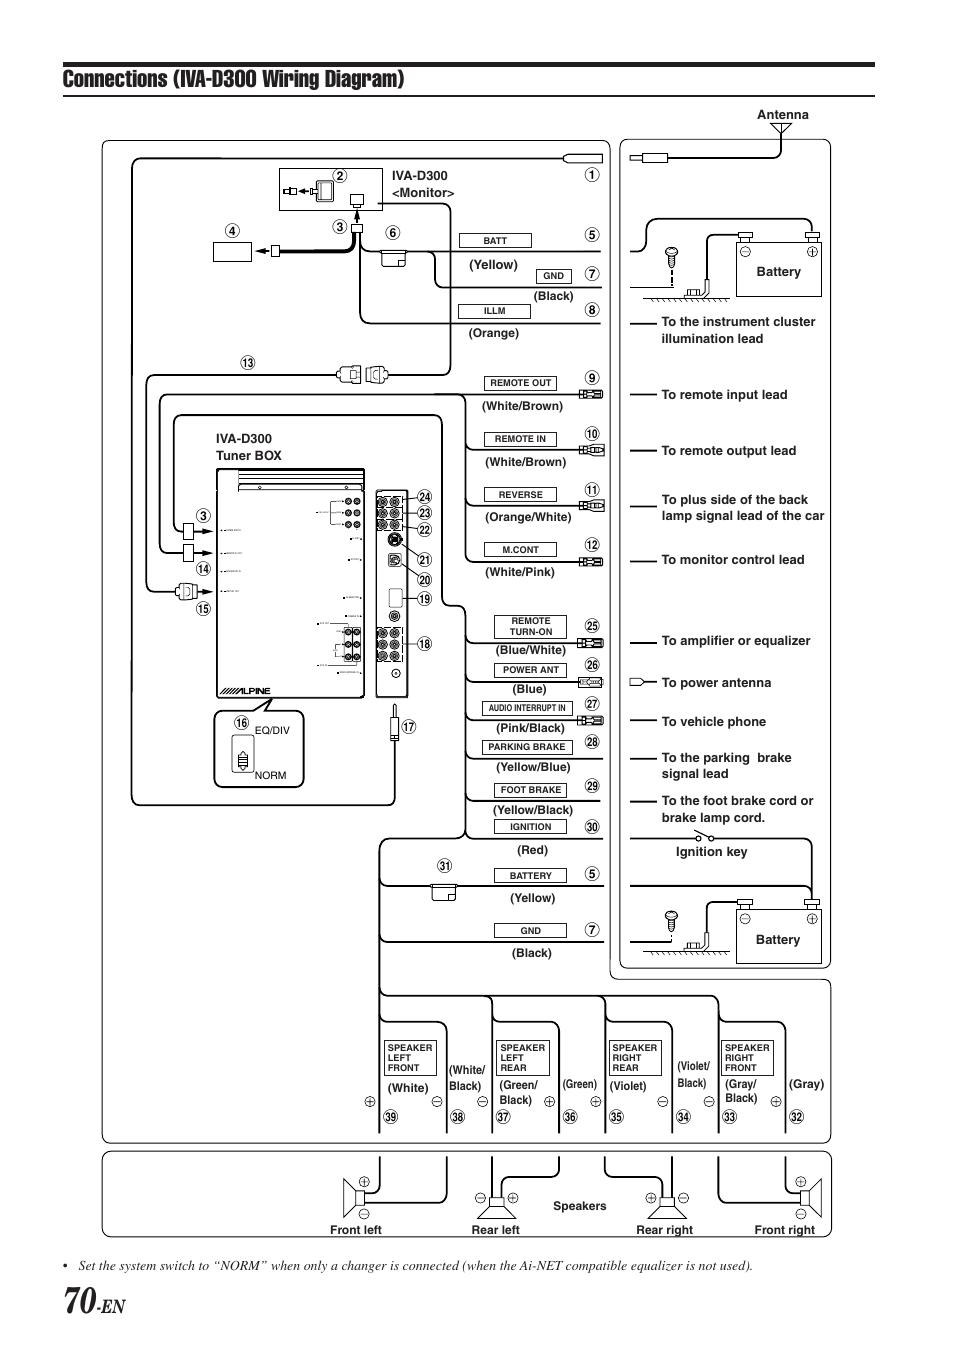 toyota aftermarket power antenna wiring diagram